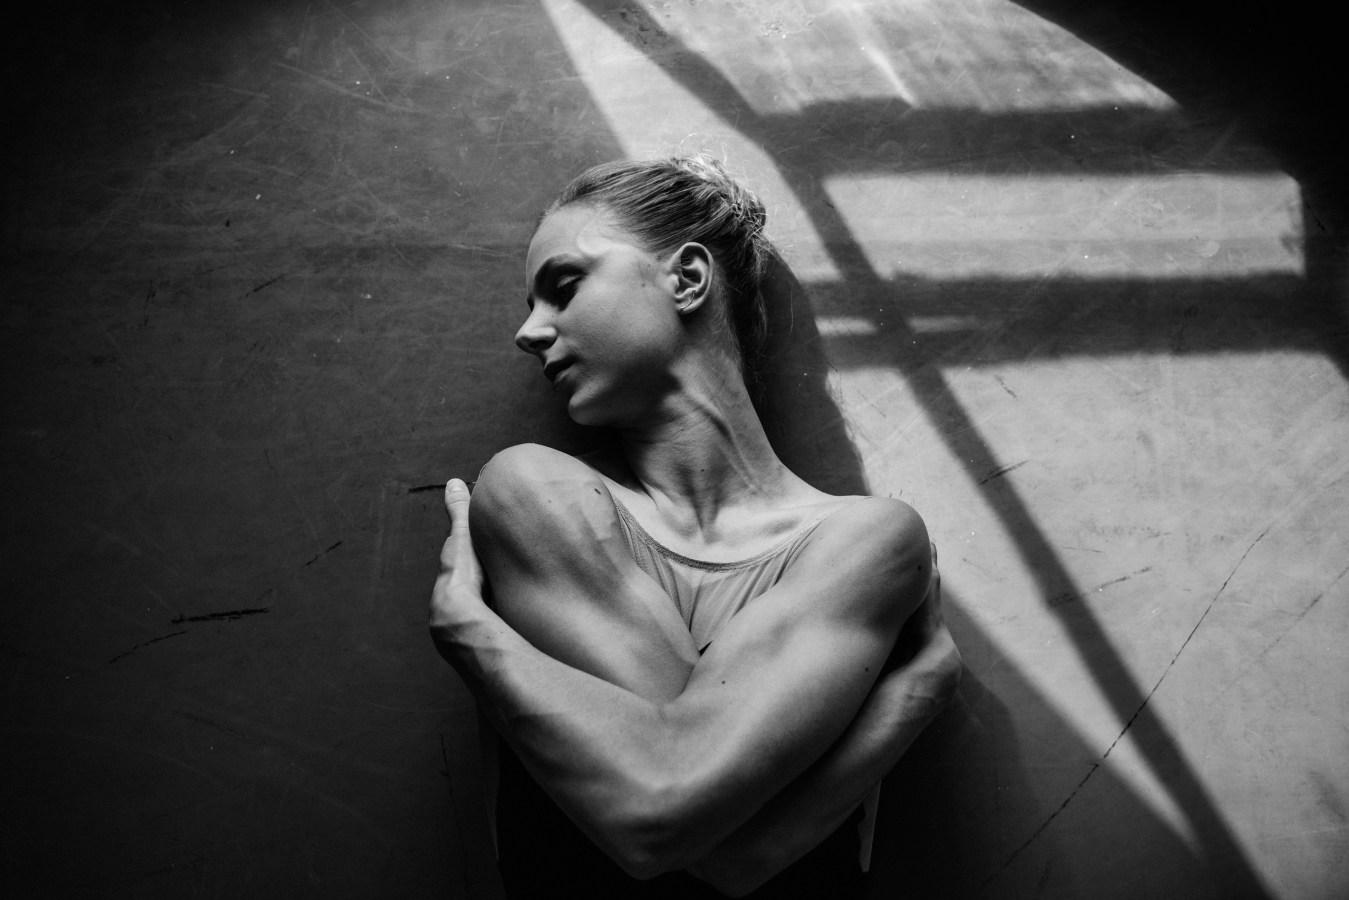 Rising star and solo dancer Ida Praetorius stretches after a training session.